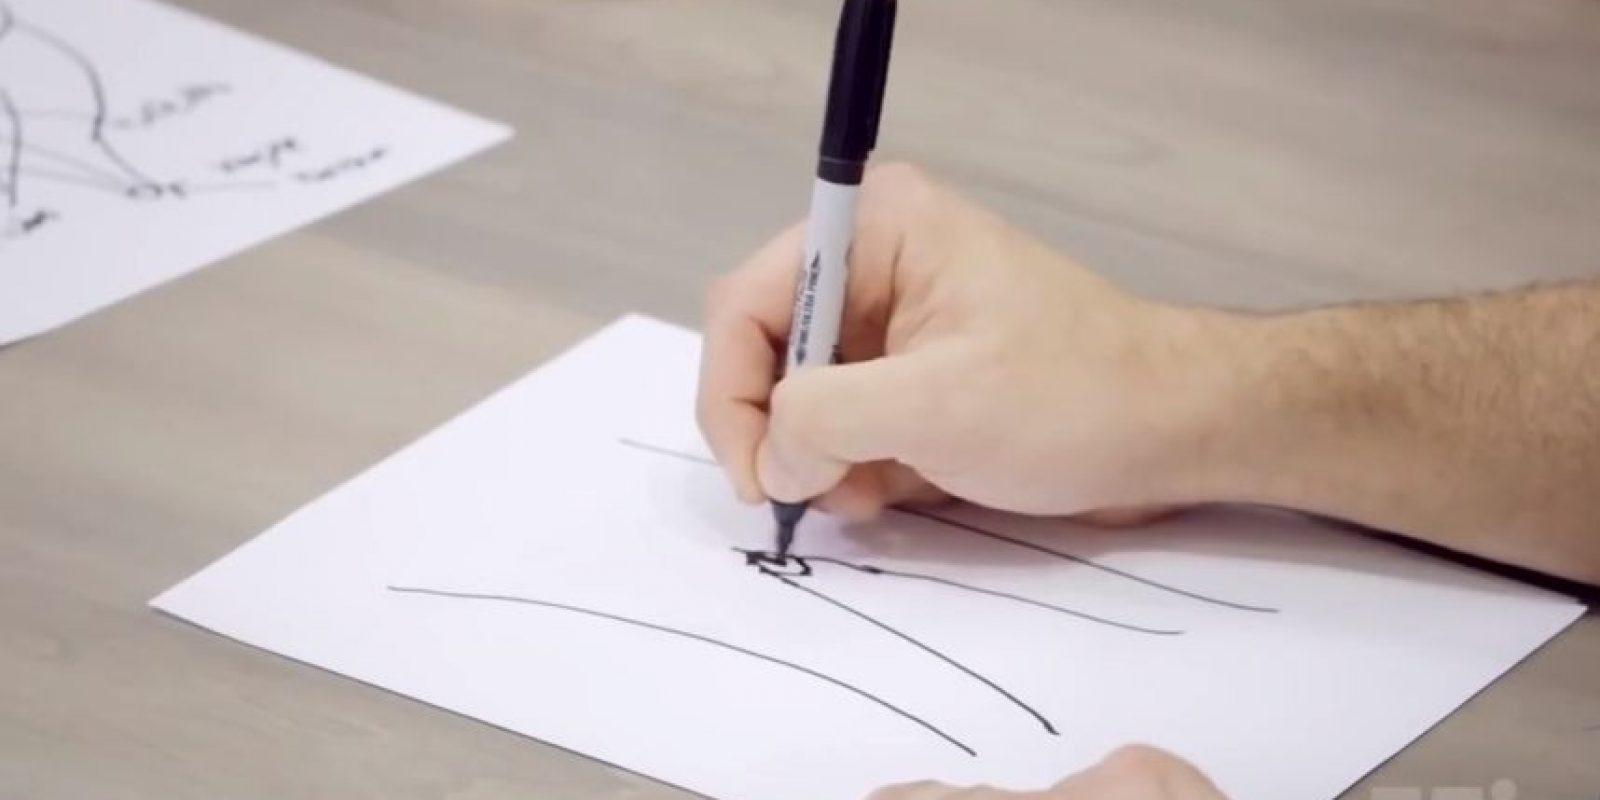 Unos la dibujaron de forma infantil. Foto:.Mic/Youtube